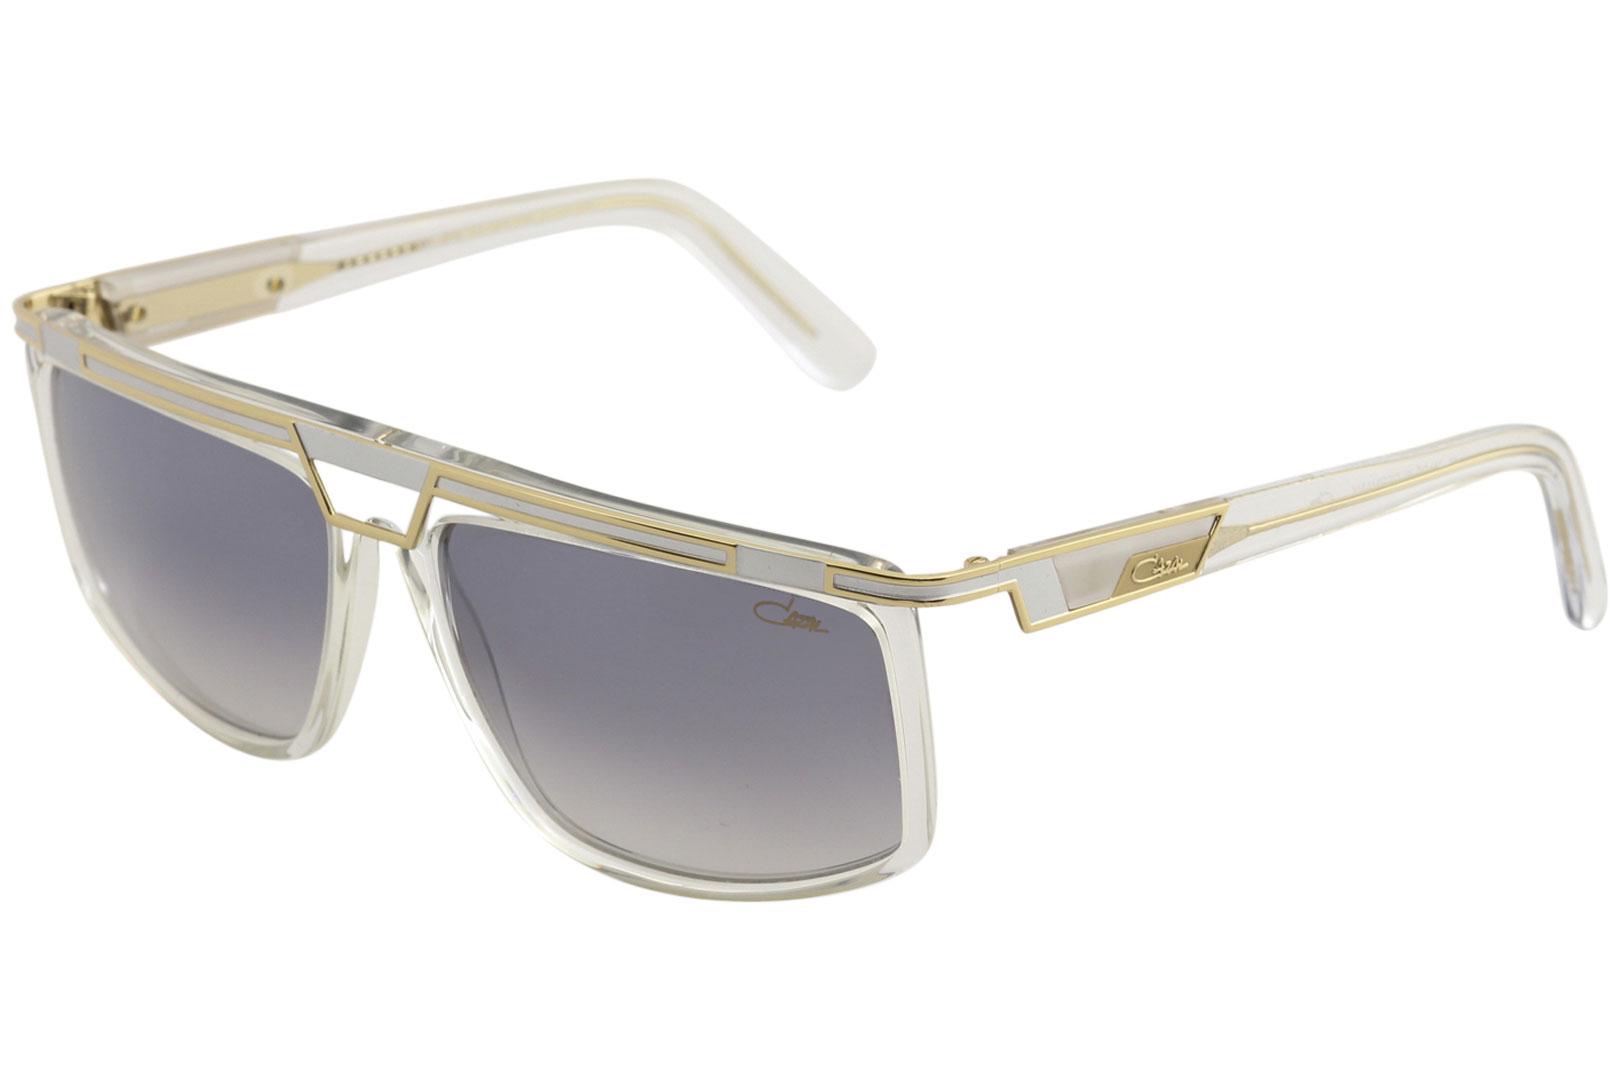 8fe16f384dc3 Cazal Legends Men s 8036 003 Crystal Gold Fashion Square Sunglasses ...